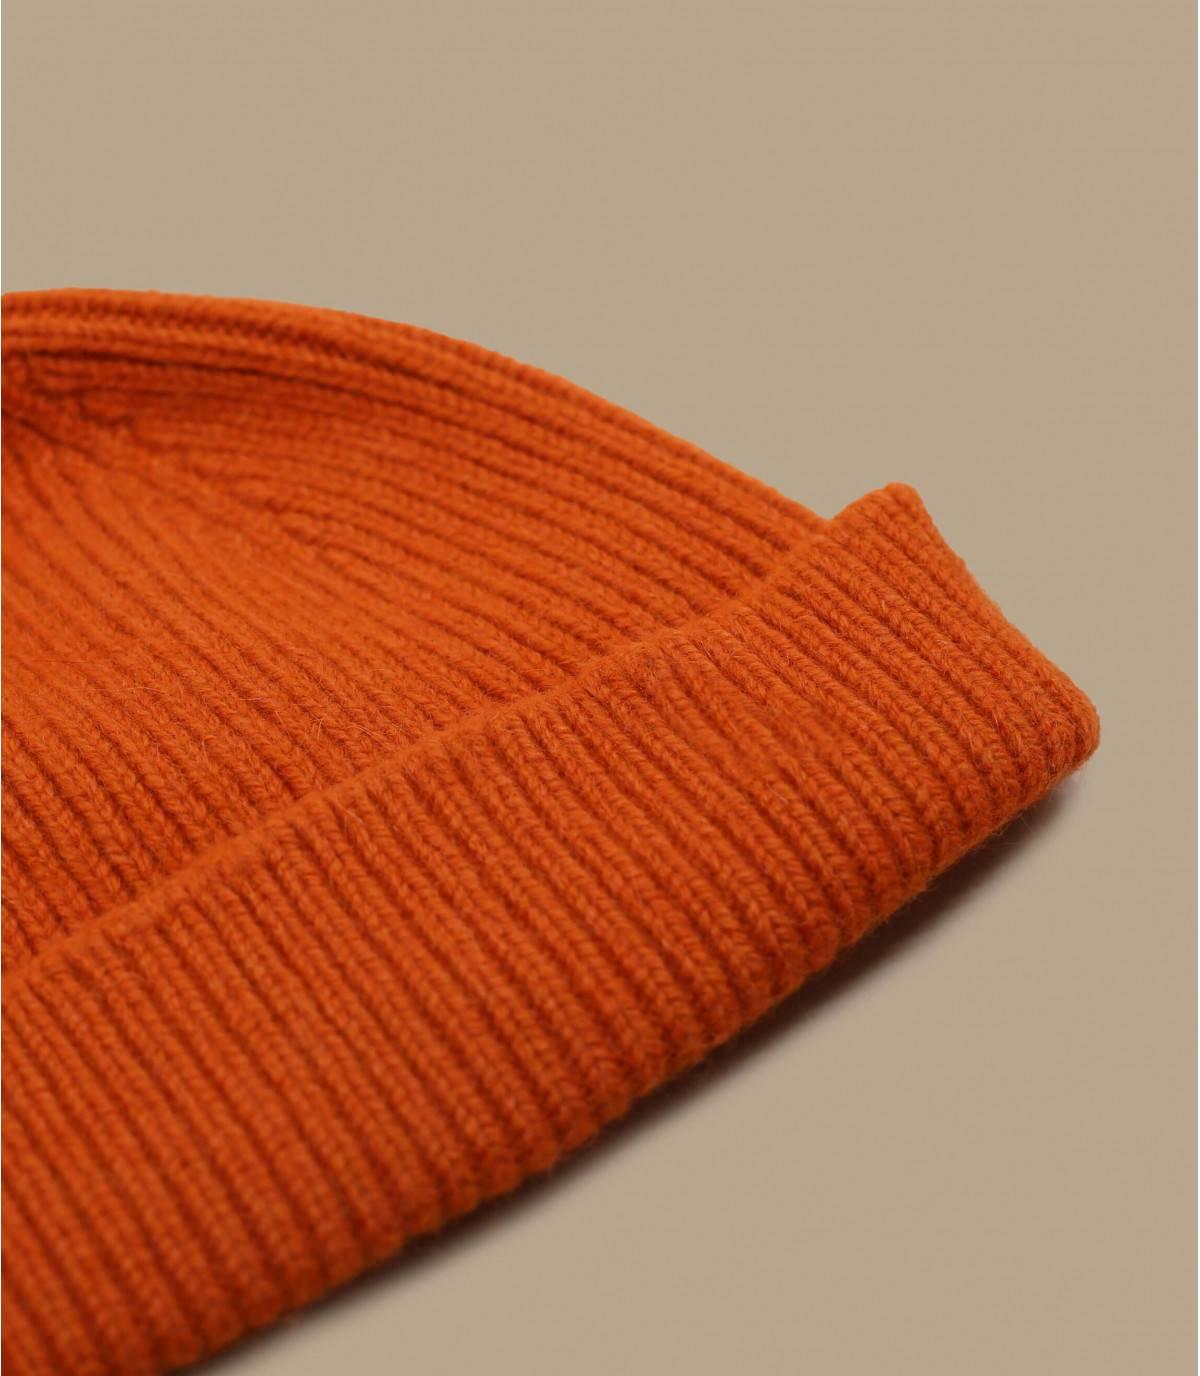 oranje dokwerker hoed angora wol